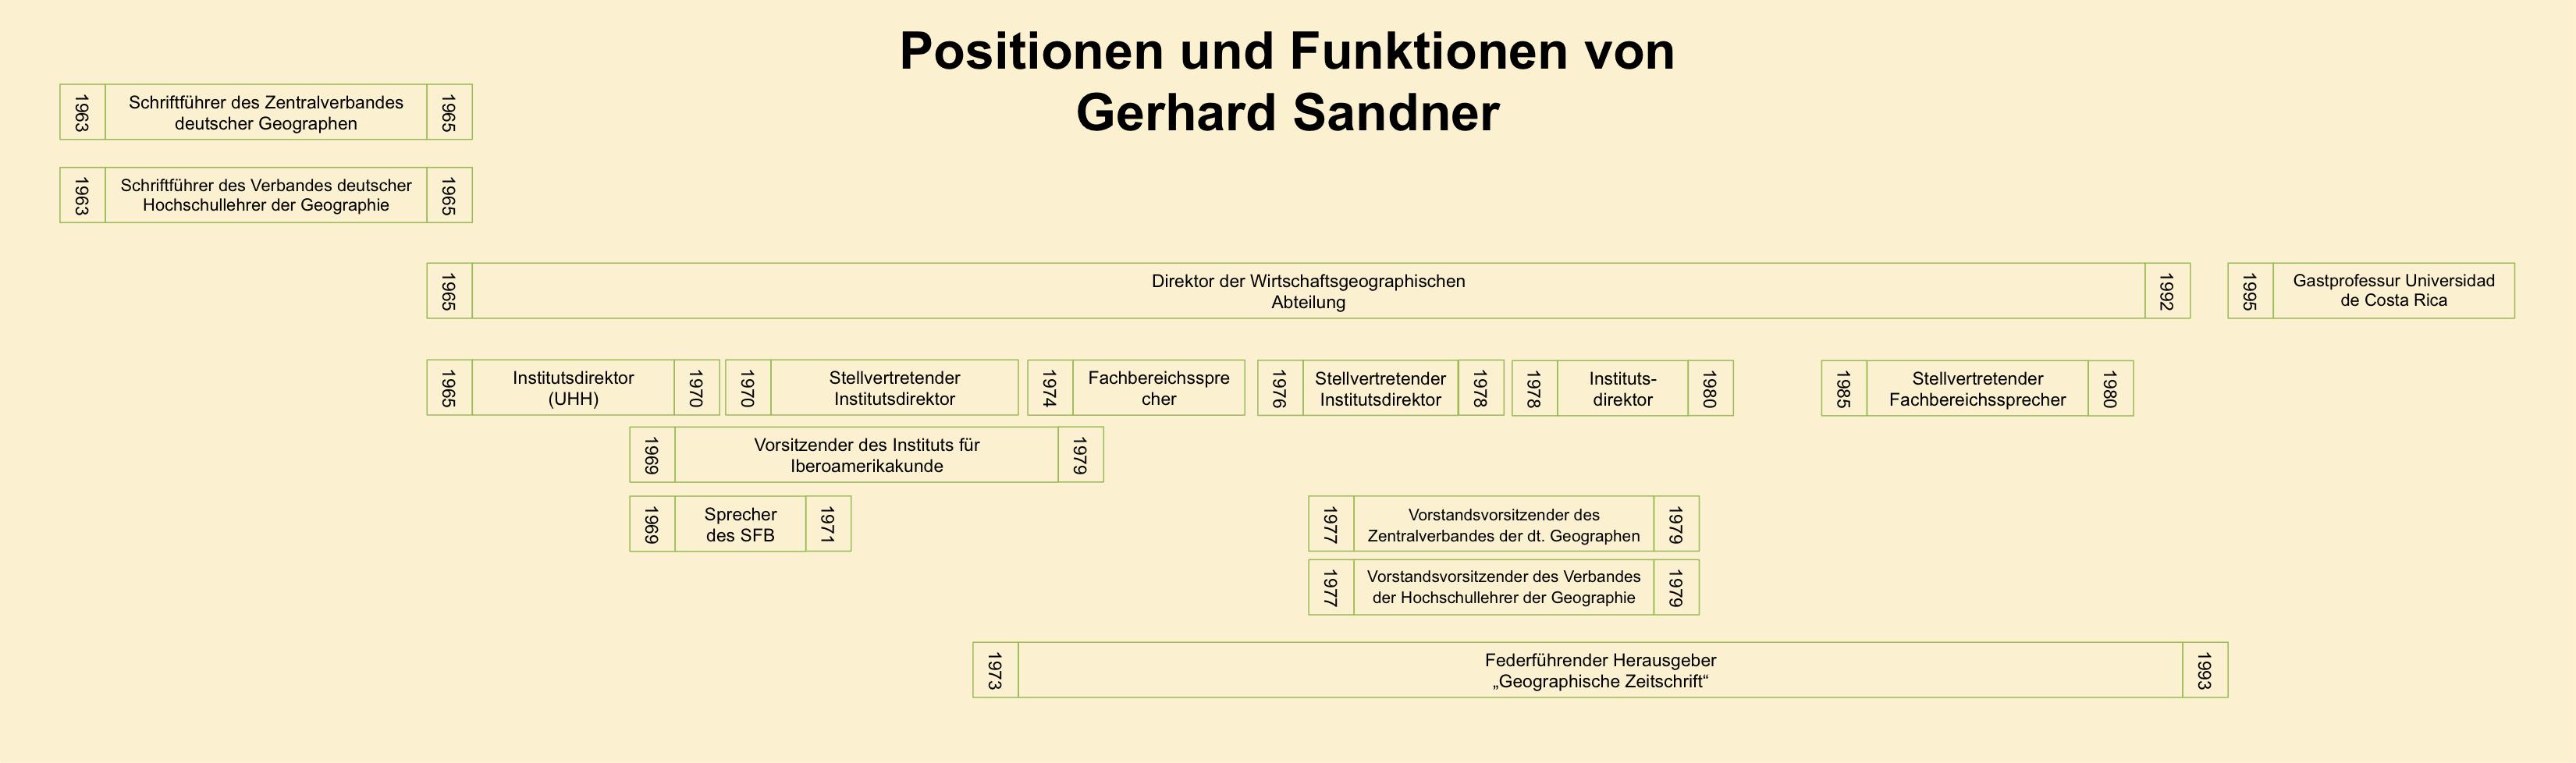 Zeitstrahl_final.png